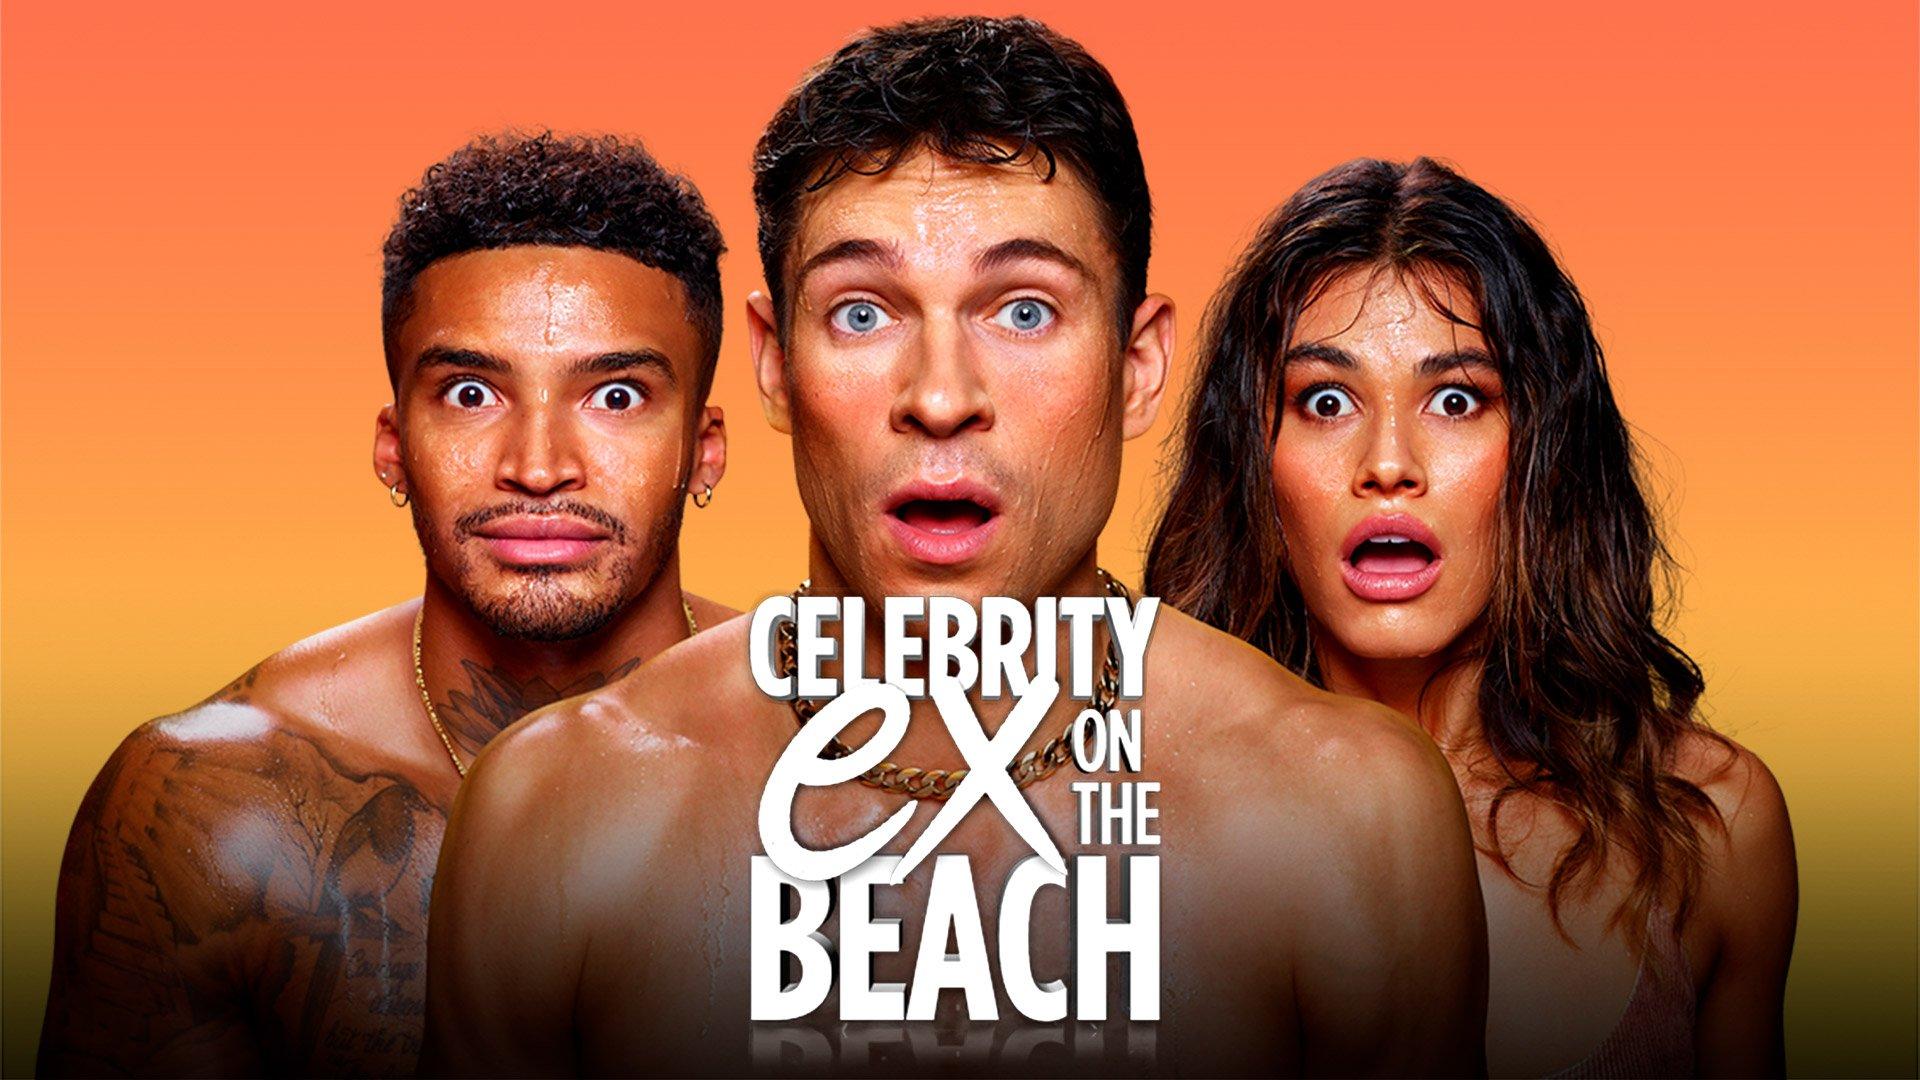 Celebrity Ex On The Beach on BritBox UK